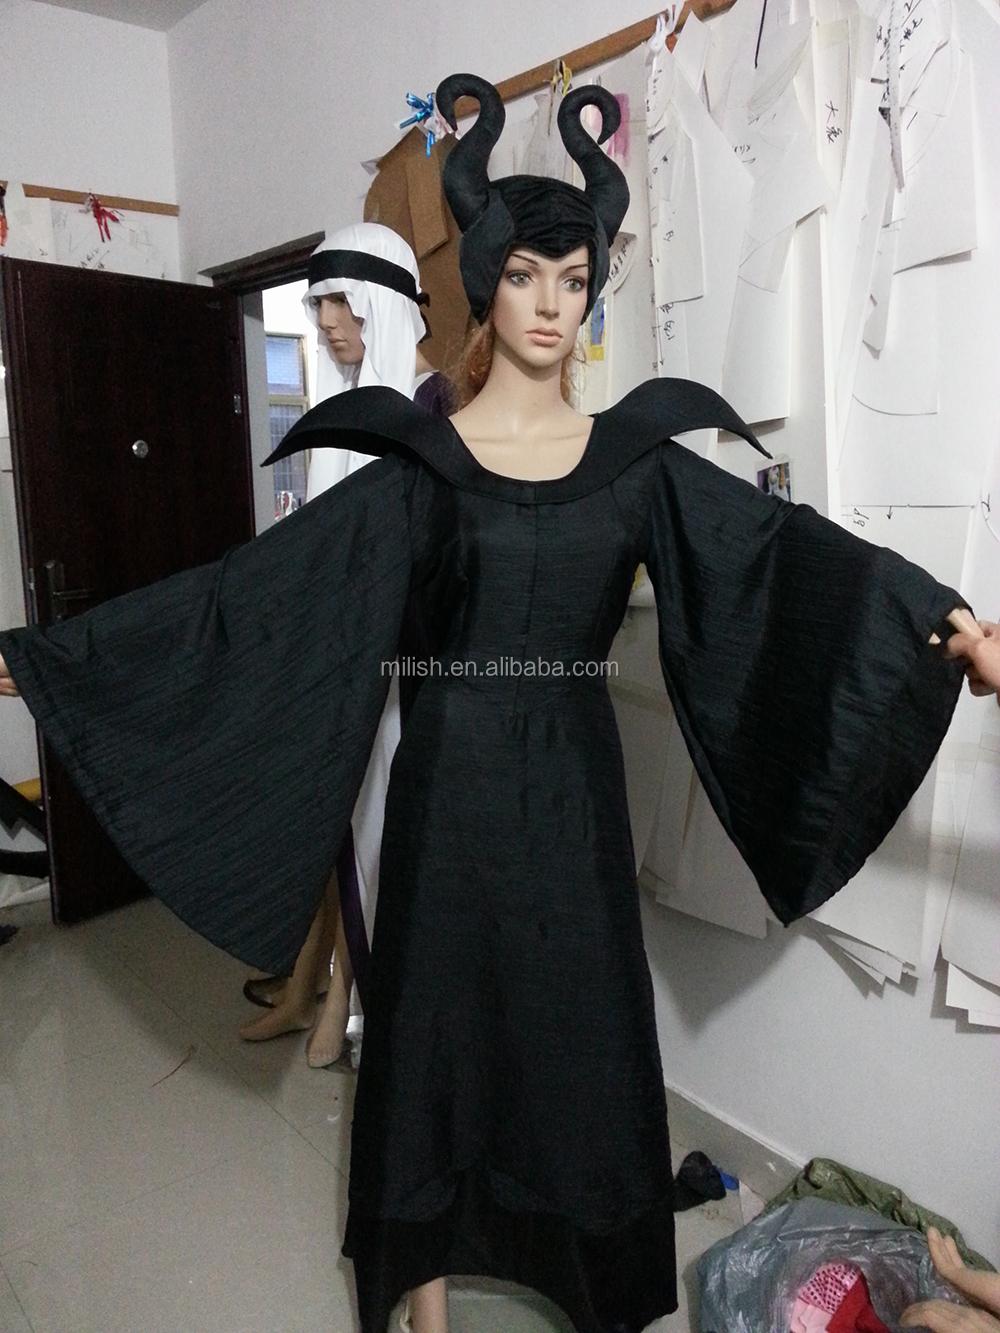 3 Month Halloween Costumes